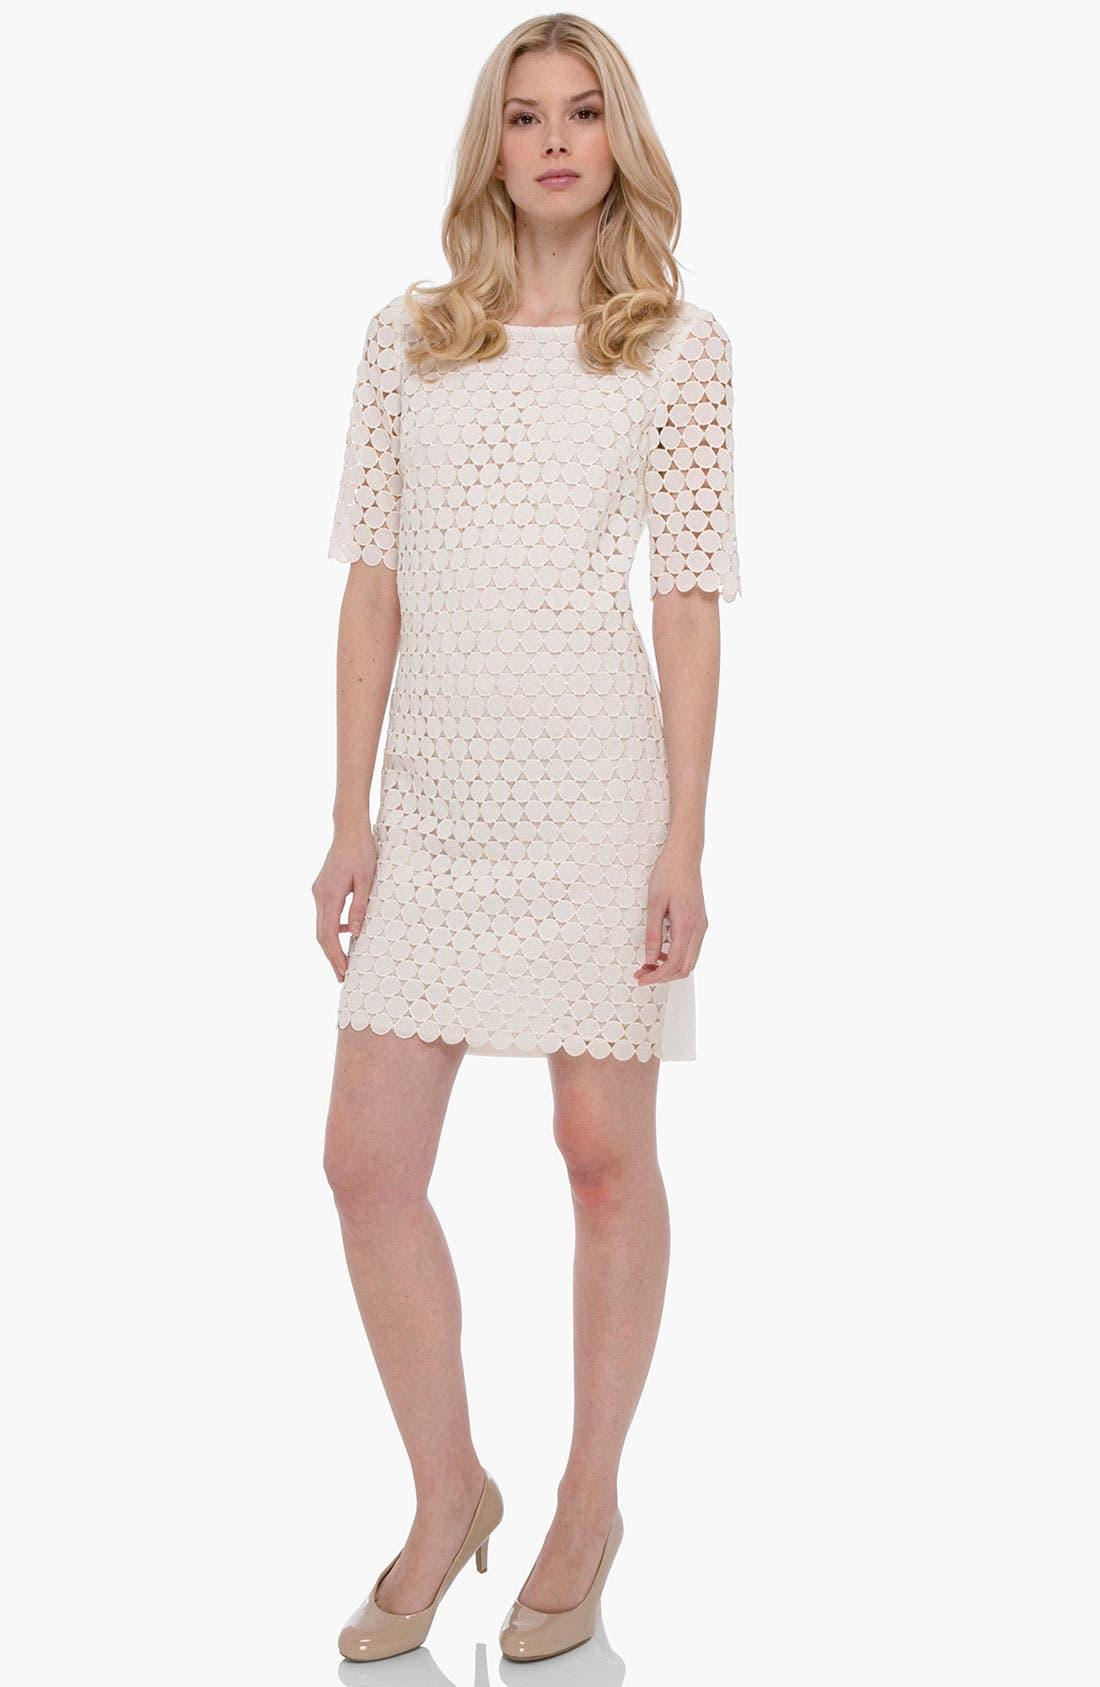 Alternate Image 1 Selected - Catherine Catherine Malandrino 'Tammy' Dress